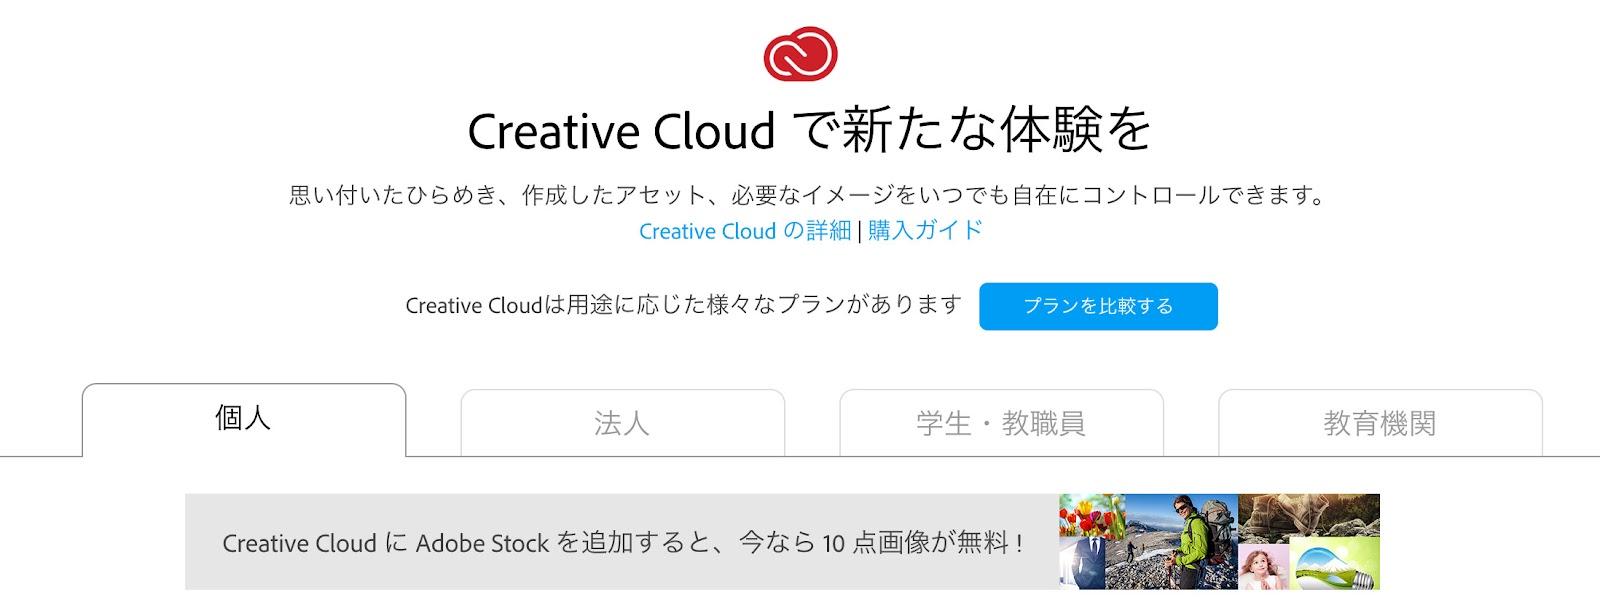 Adobeccplan